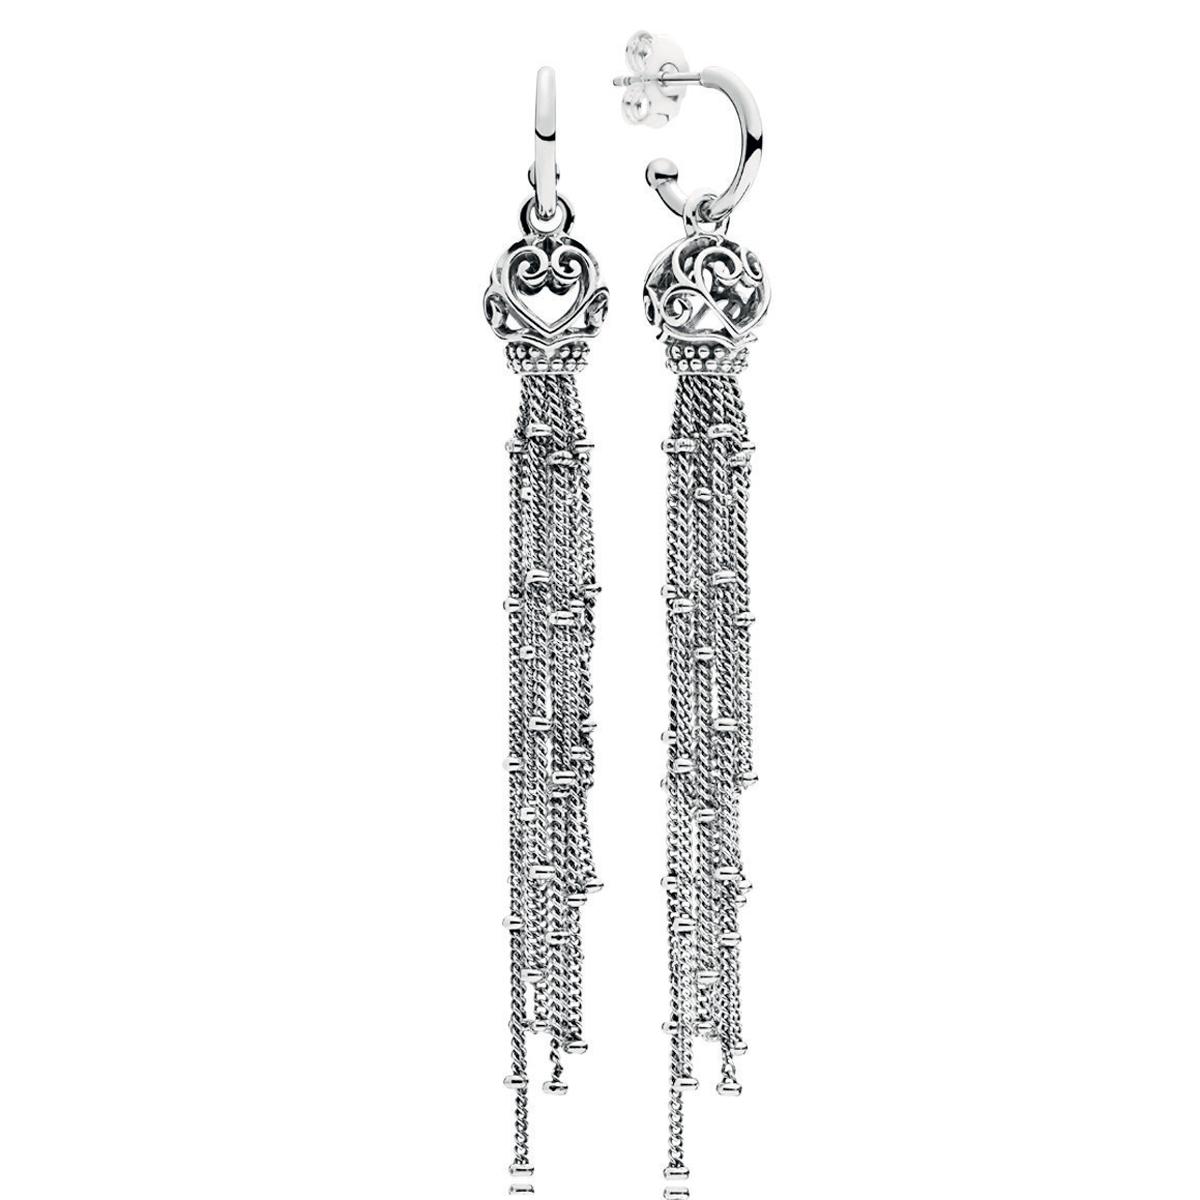 db76ac5c2 PANDORA Elegant Waves Hoop Earrings - Pancharmbracelets.com